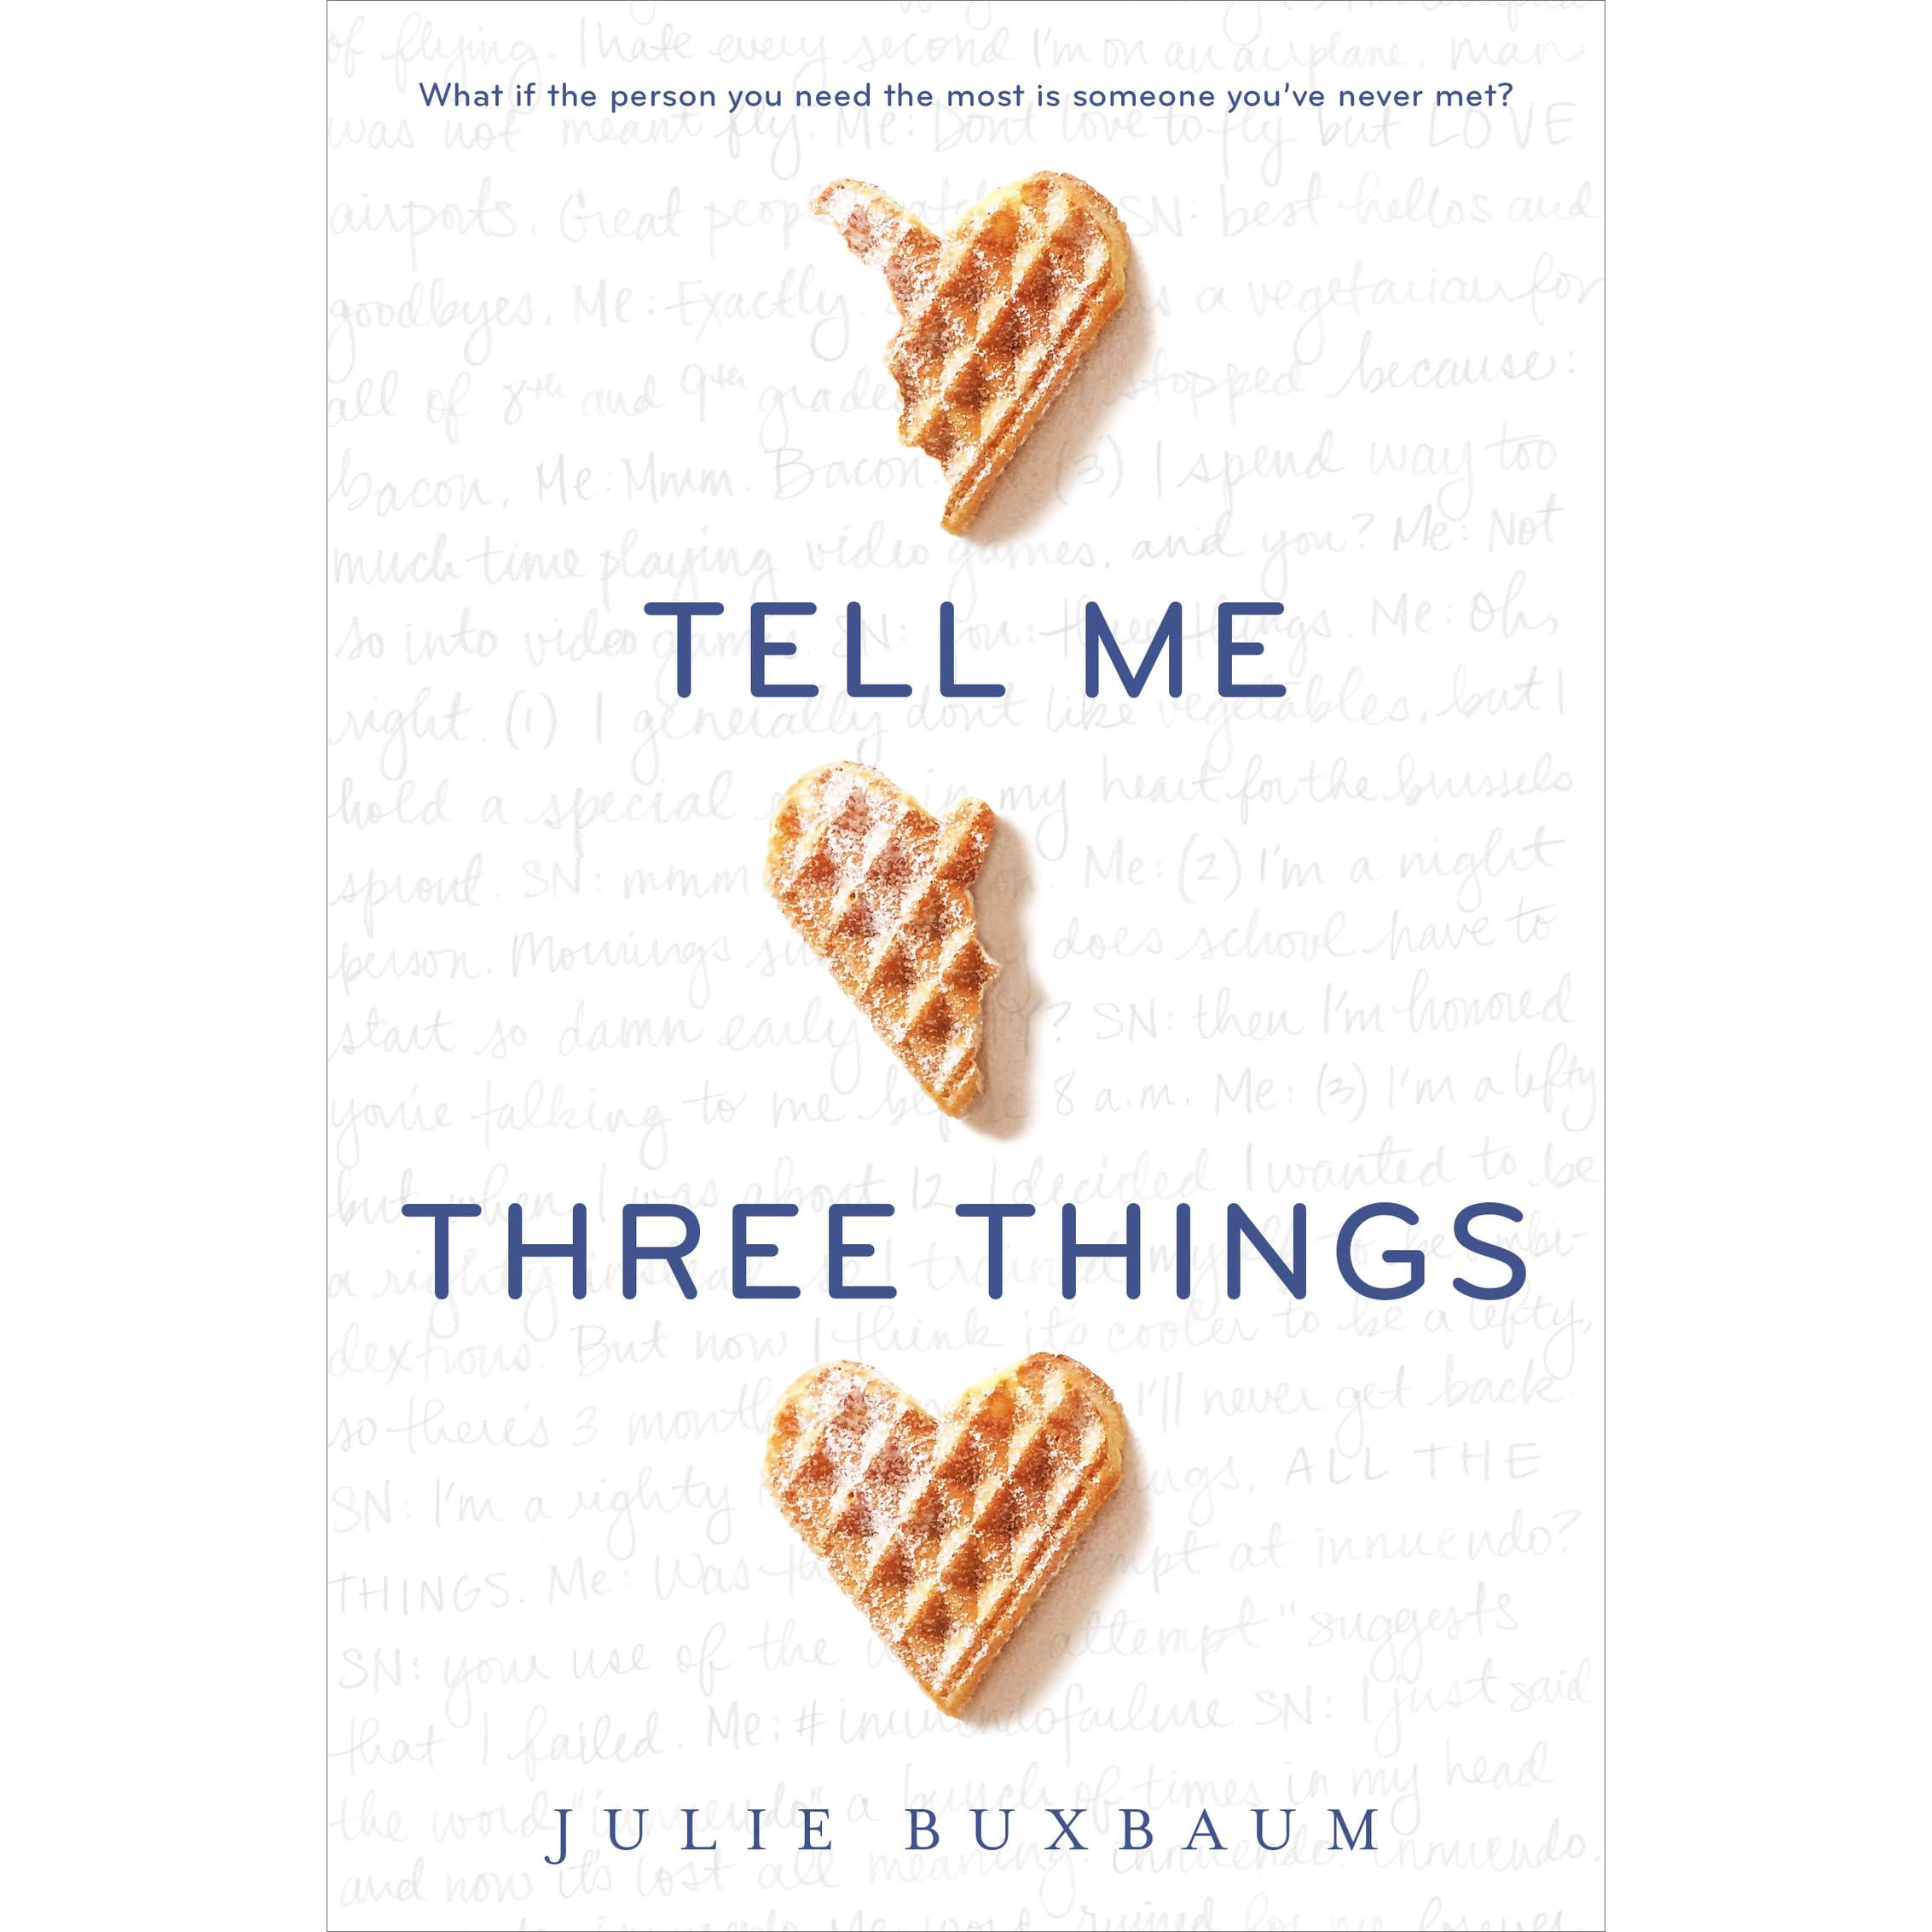 cf6cd2d25 Tell Me Three Things by Julie Buxbaum